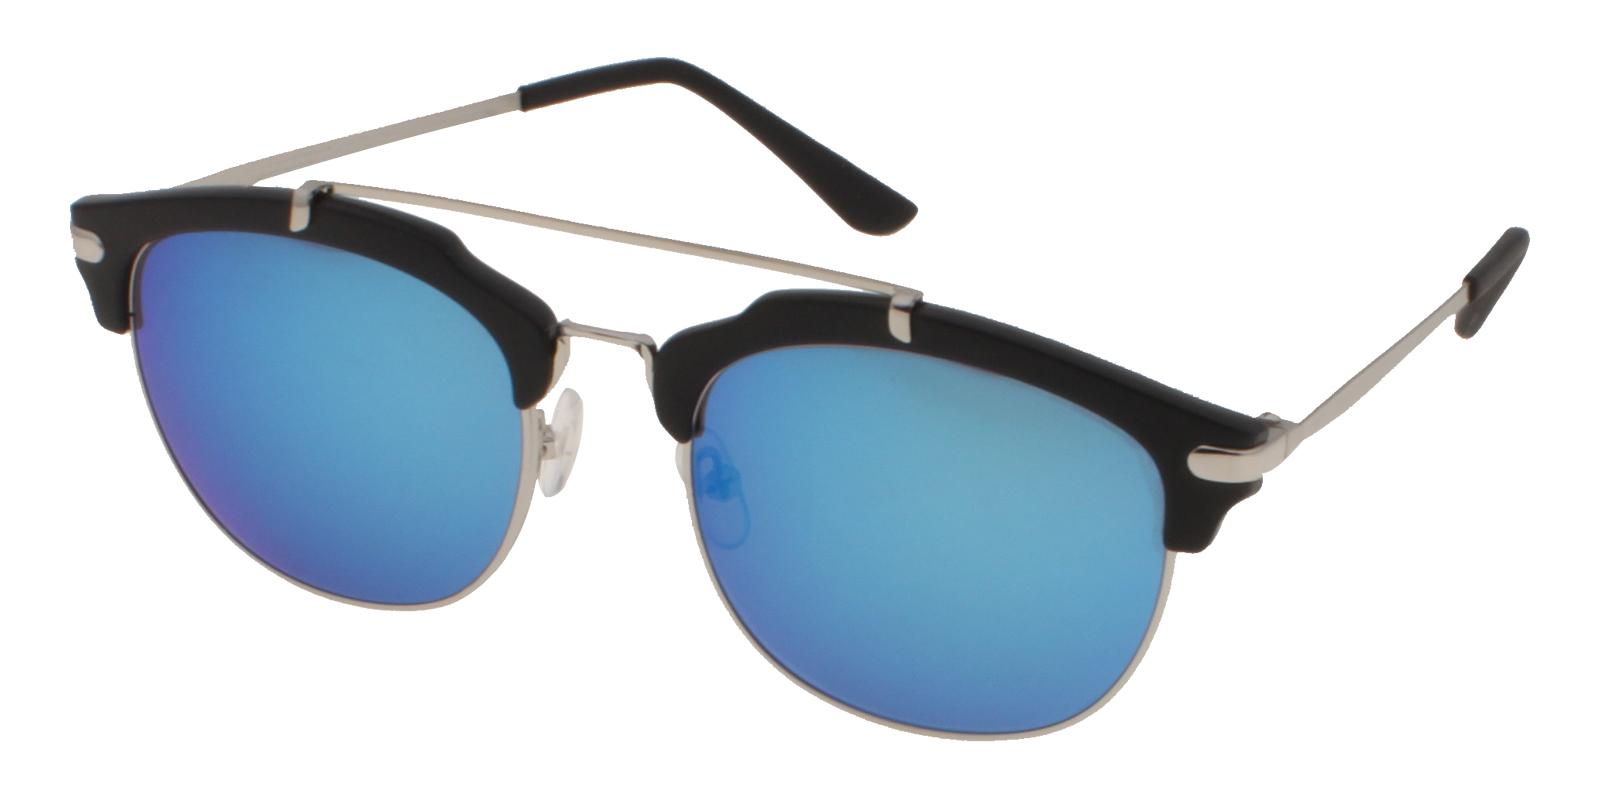 Cuba Black Acetate NosePads , Sunglasses Frames from ABBE Glasses